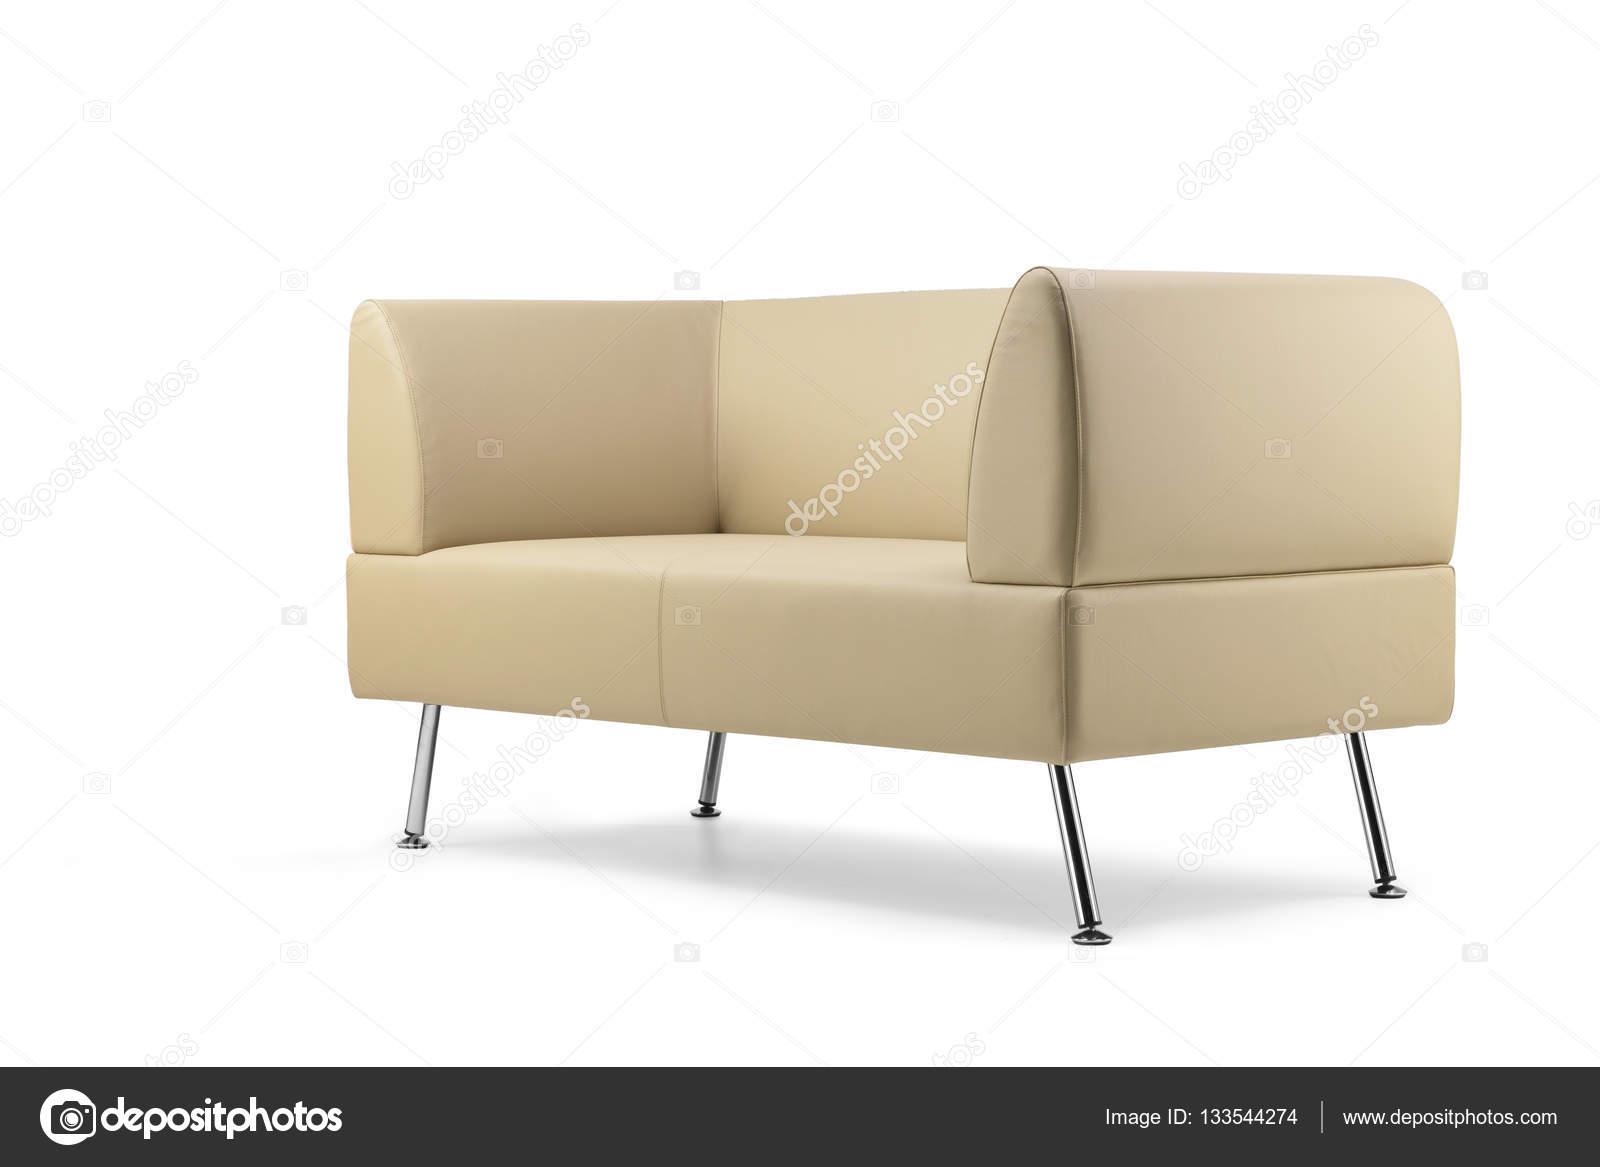 Stupendous Beige Leather Sofa Side View Stock Photo C Antoniotruzzi Squirreltailoven Fun Painted Chair Ideas Images Squirreltailovenorg